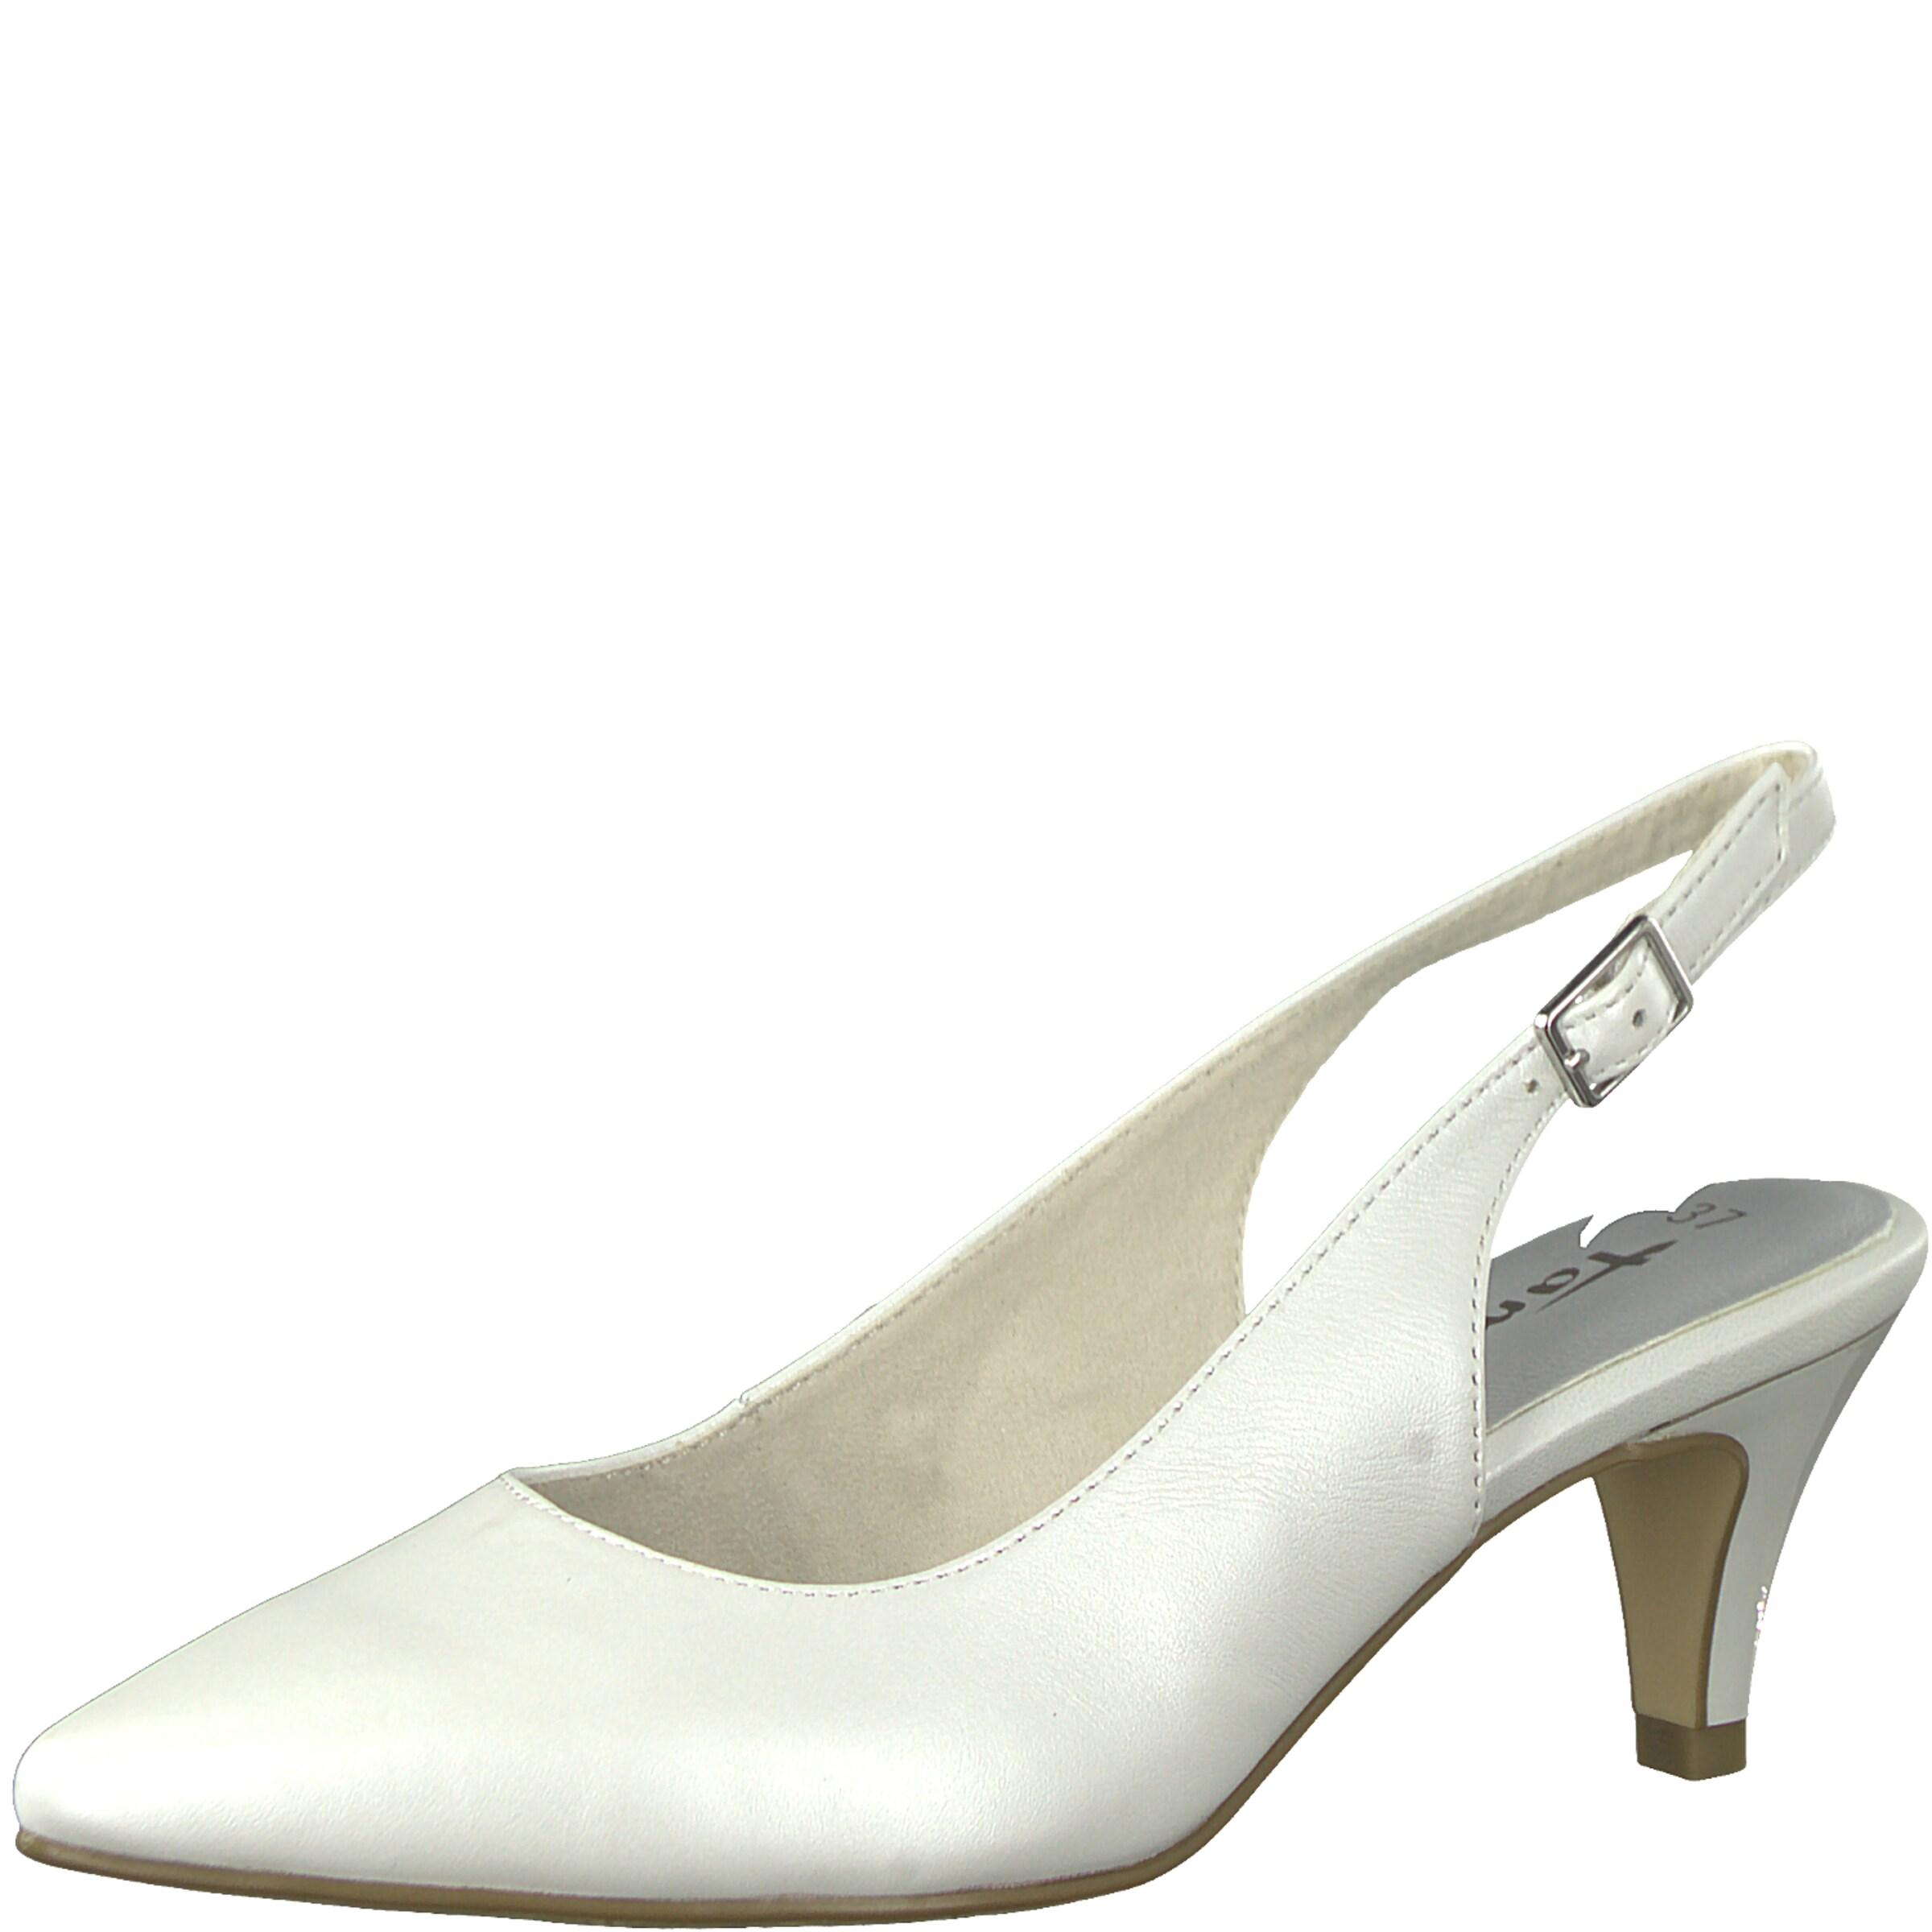 TAMARIS Slingpump classy Verschleißfeste billige Schuhe